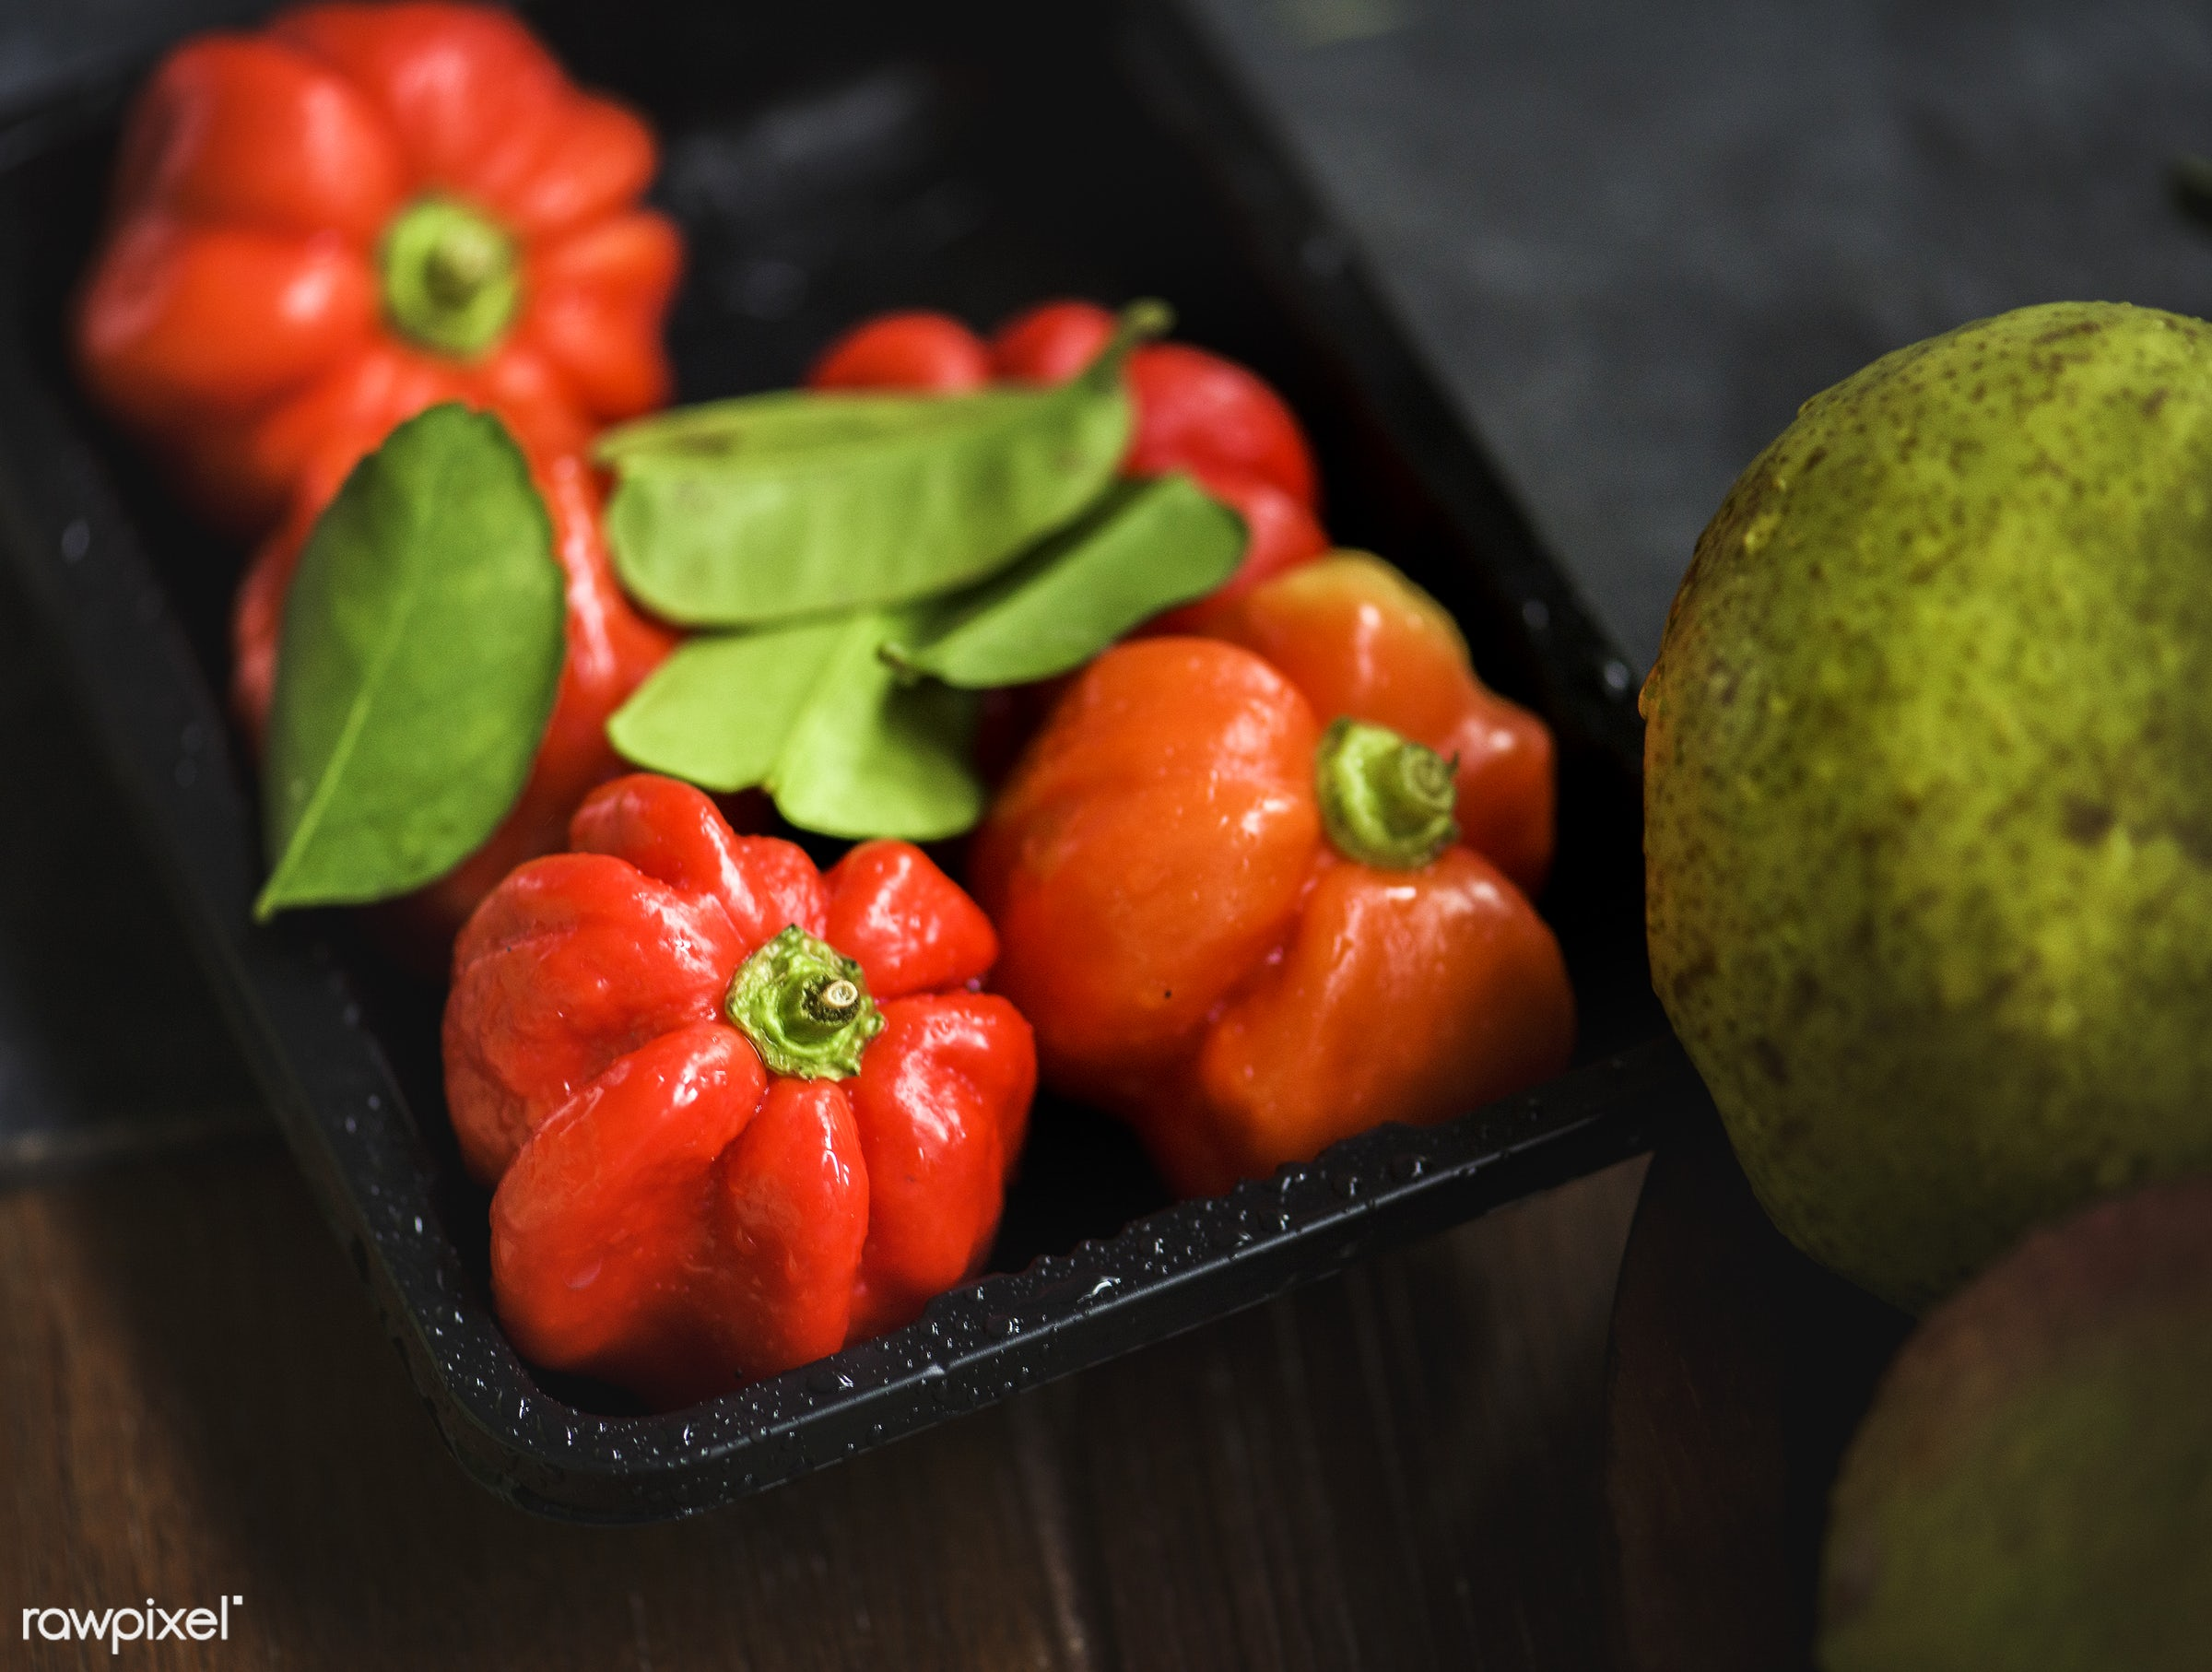 raw, bell pepper, culinary, veggies, fiber, edible, organic, nutrition, fresh, food, healthy, ingredient, vegetable, natural